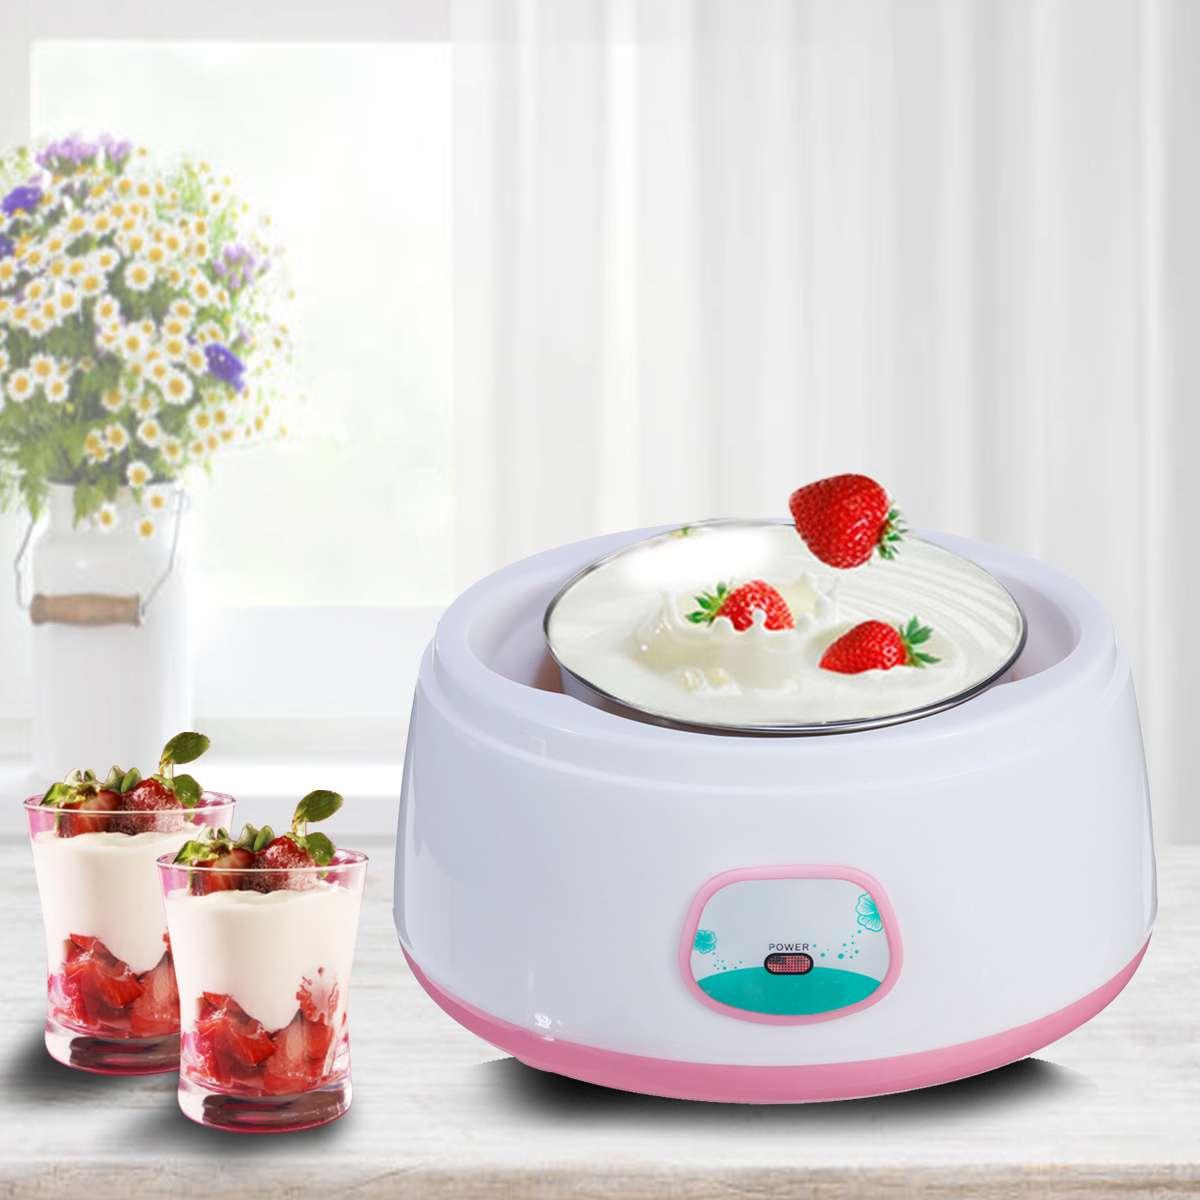 1.2L Yogurt Makers Full Automatic Yogurt Machine Maker 220V Household Stainless Steel/PP DIY Yogurt Tools Mini Kitchen Appliance